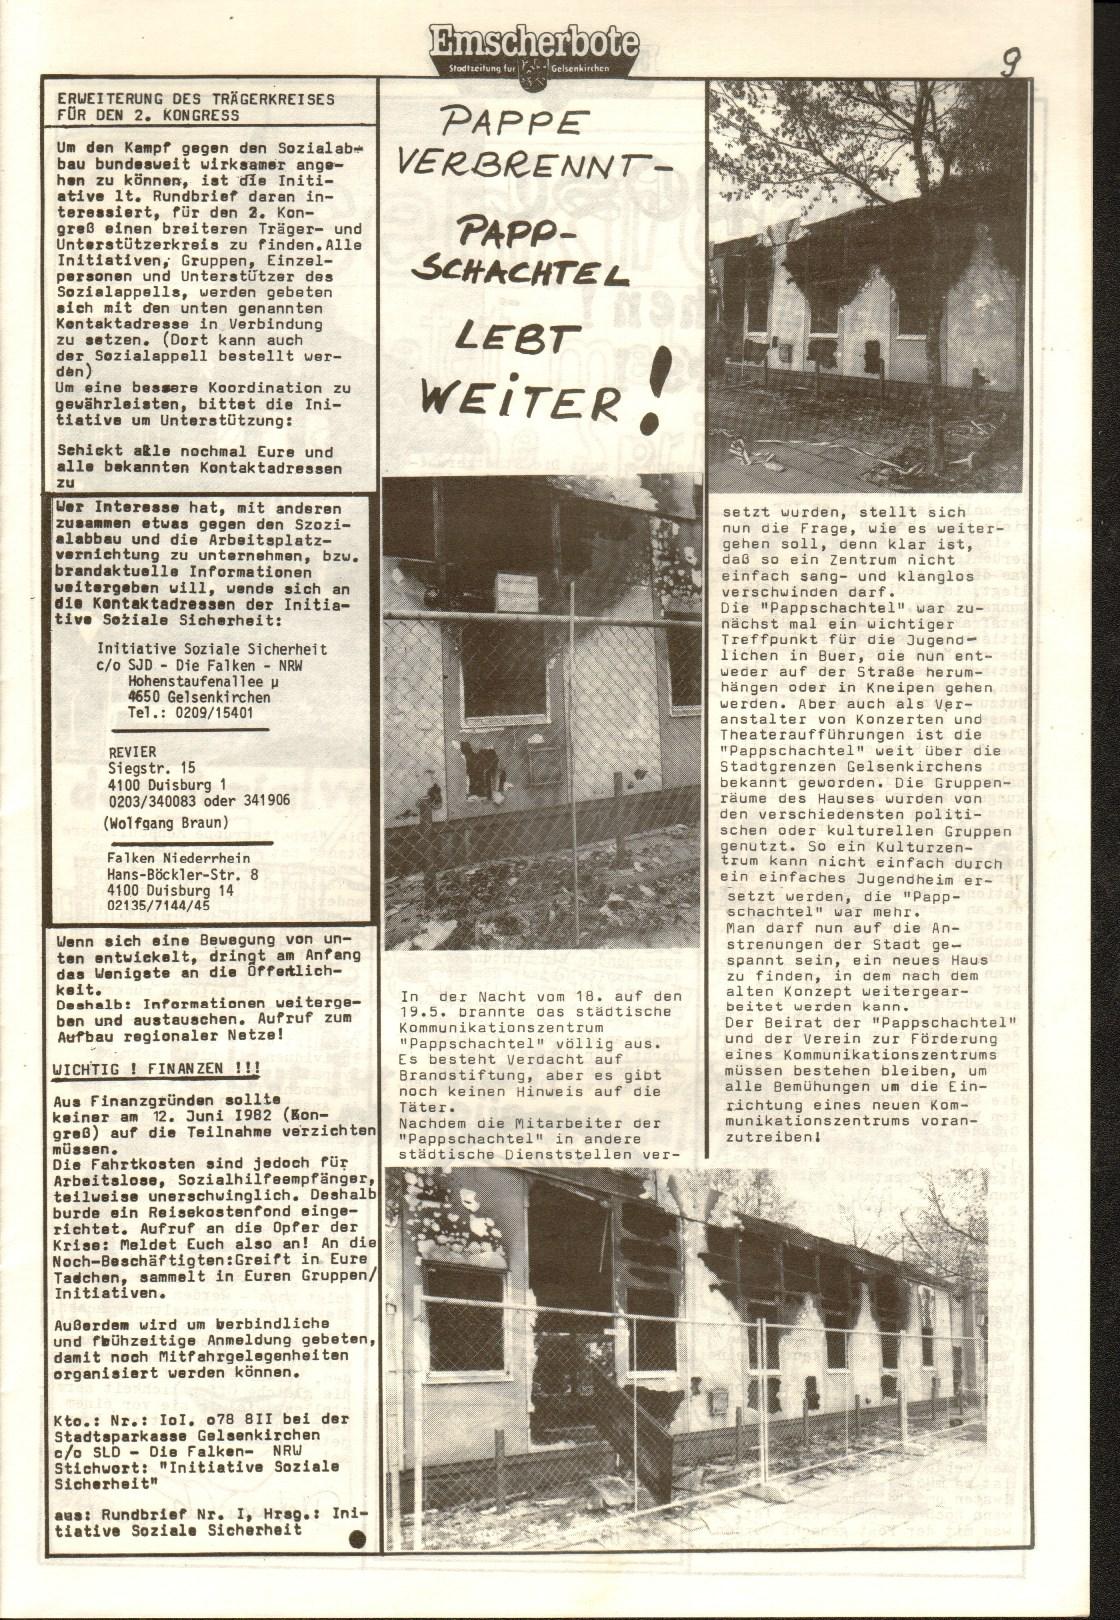 Gelsenkirchen_Emscherbote_1982_18_09